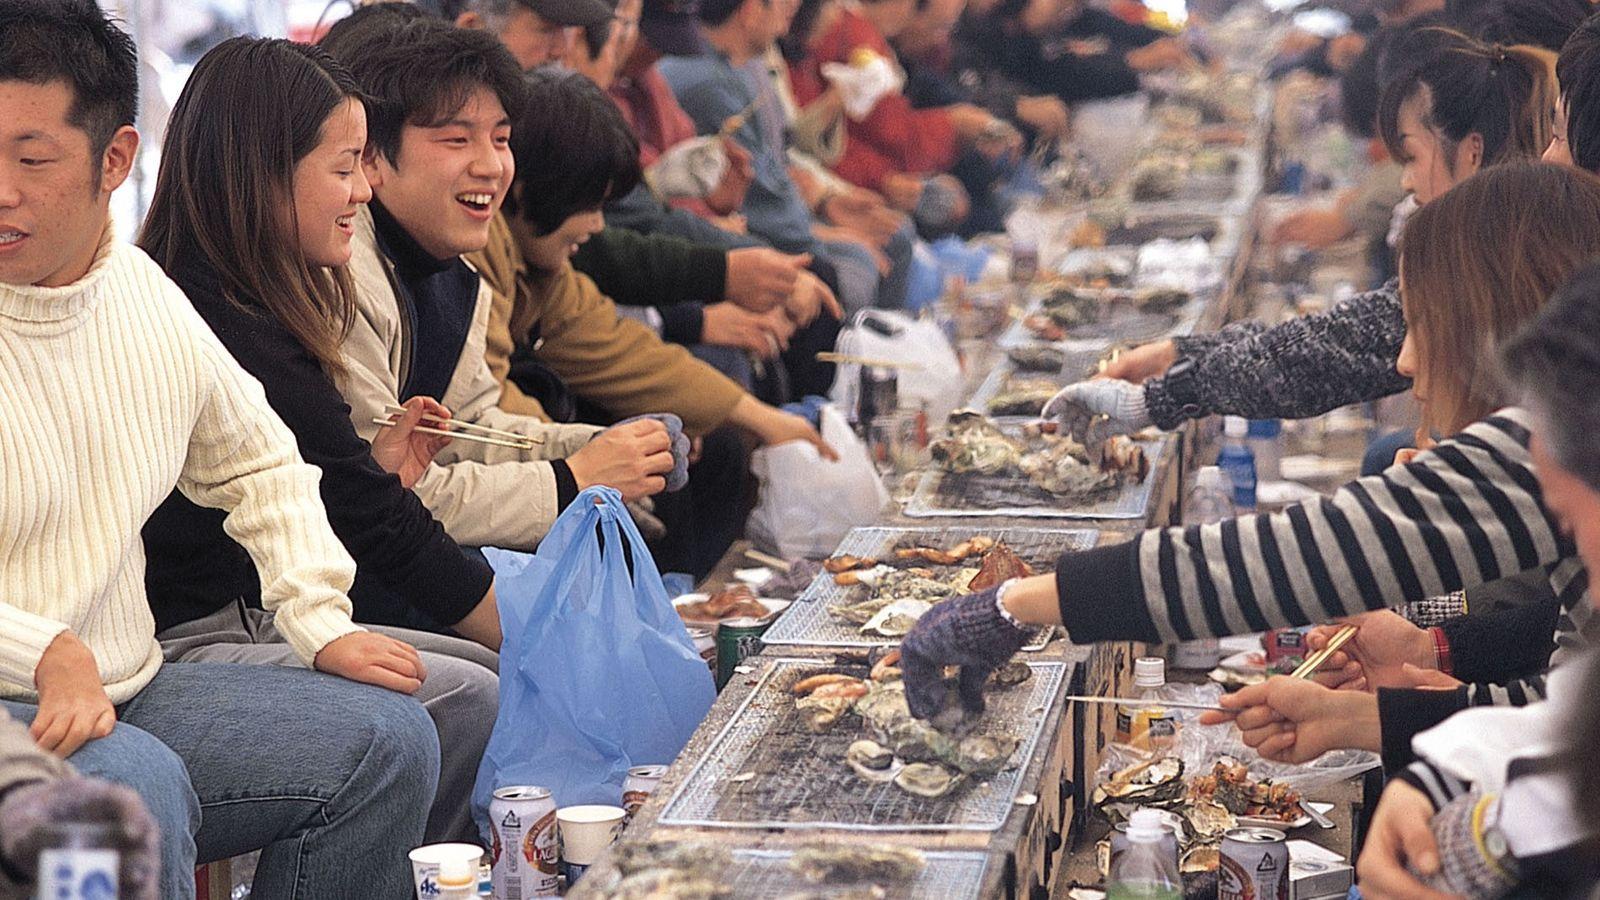 Oyster Festival, Hiroshima